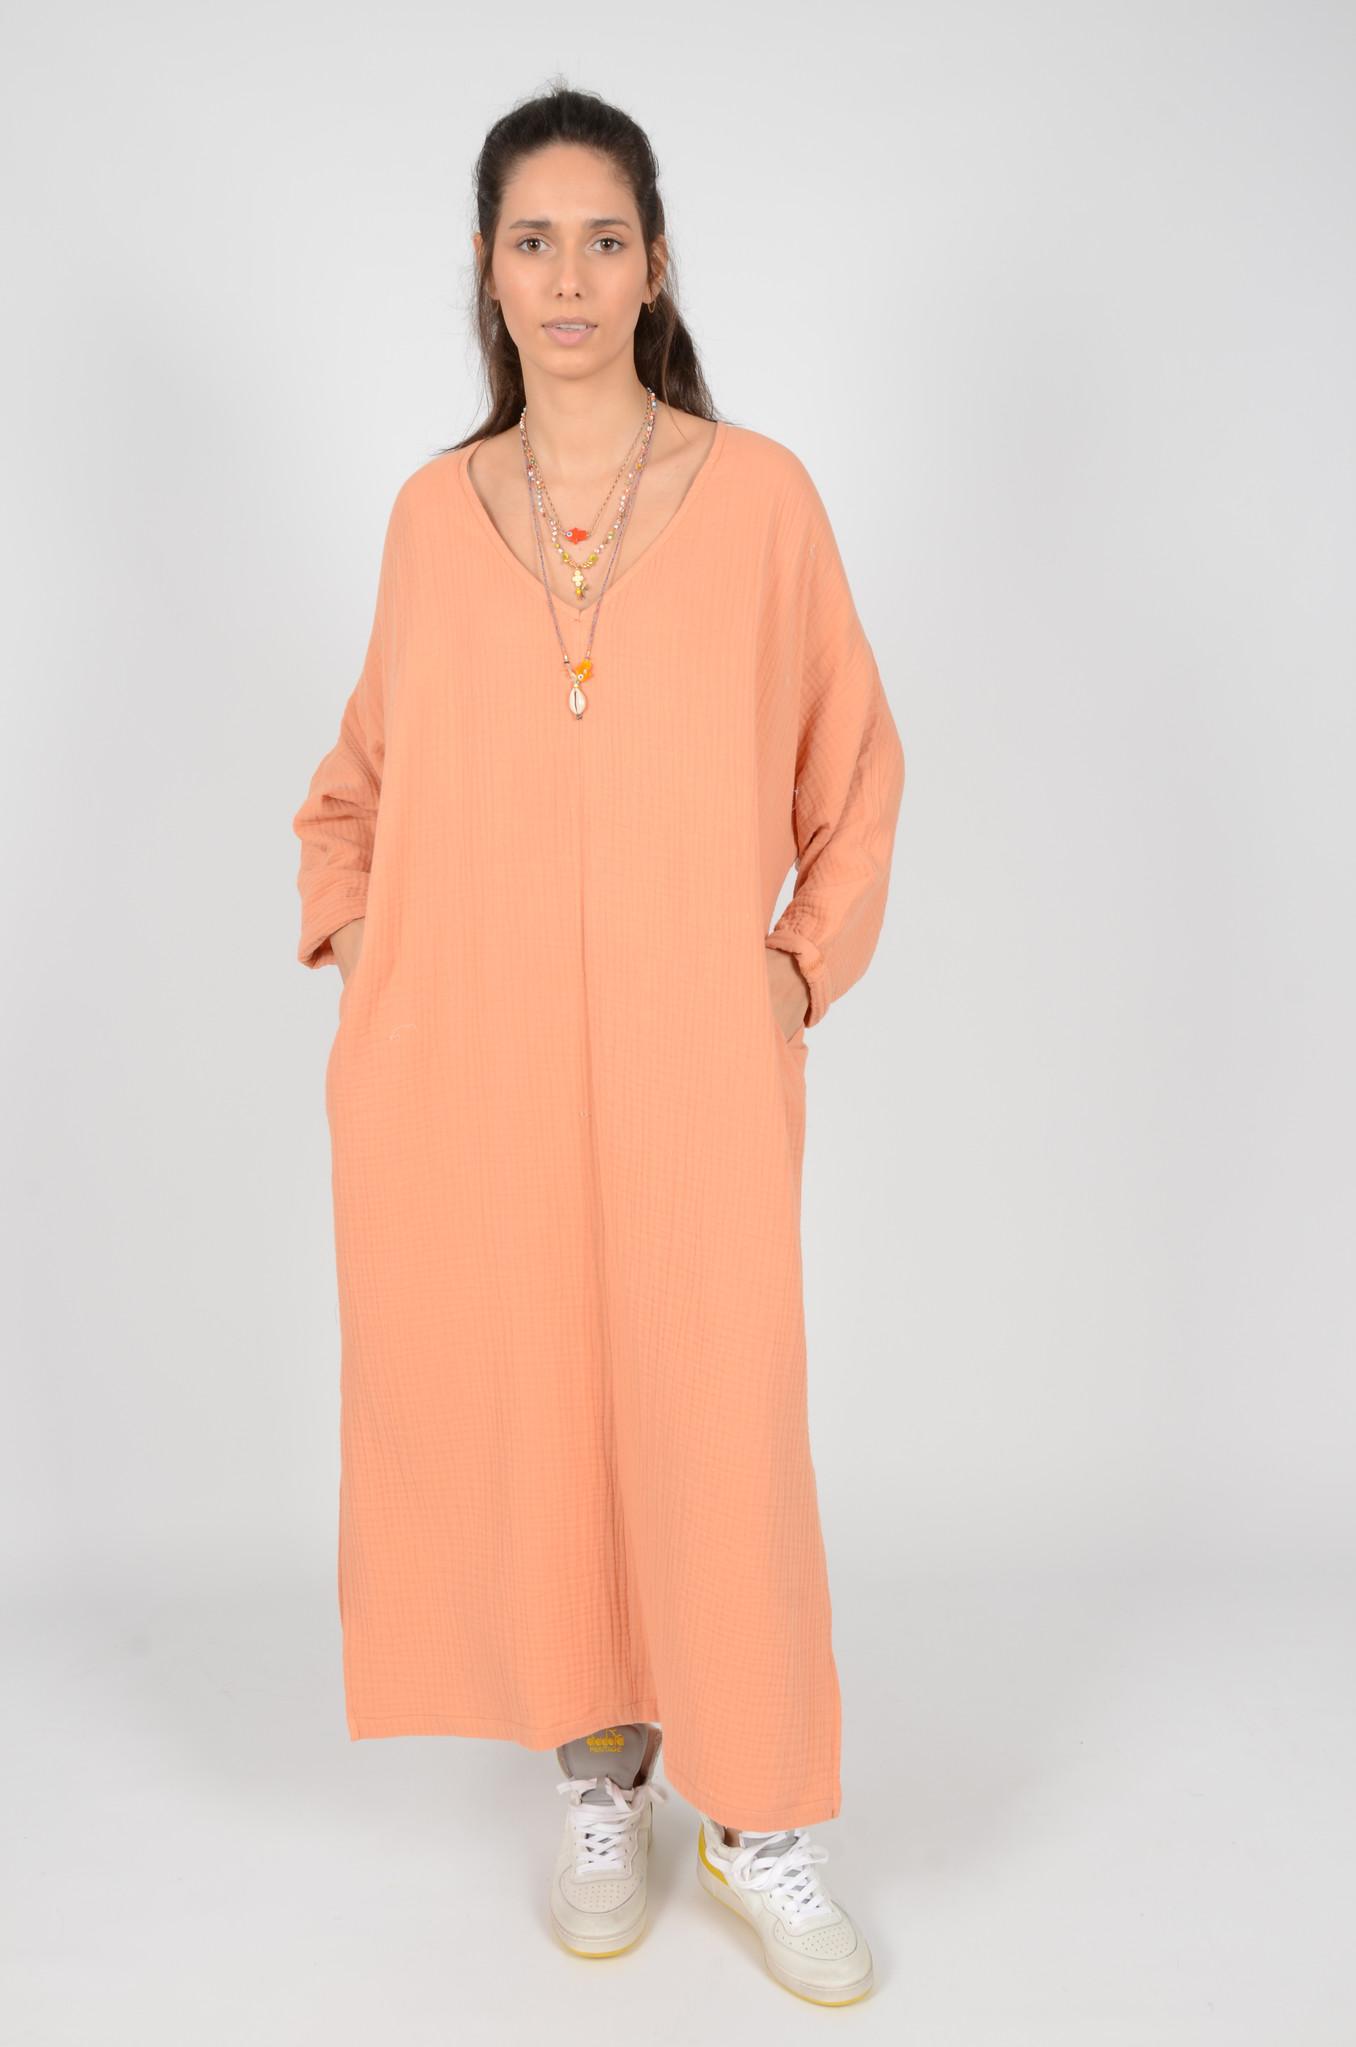 SONEVA DRESS IN PEACH-6